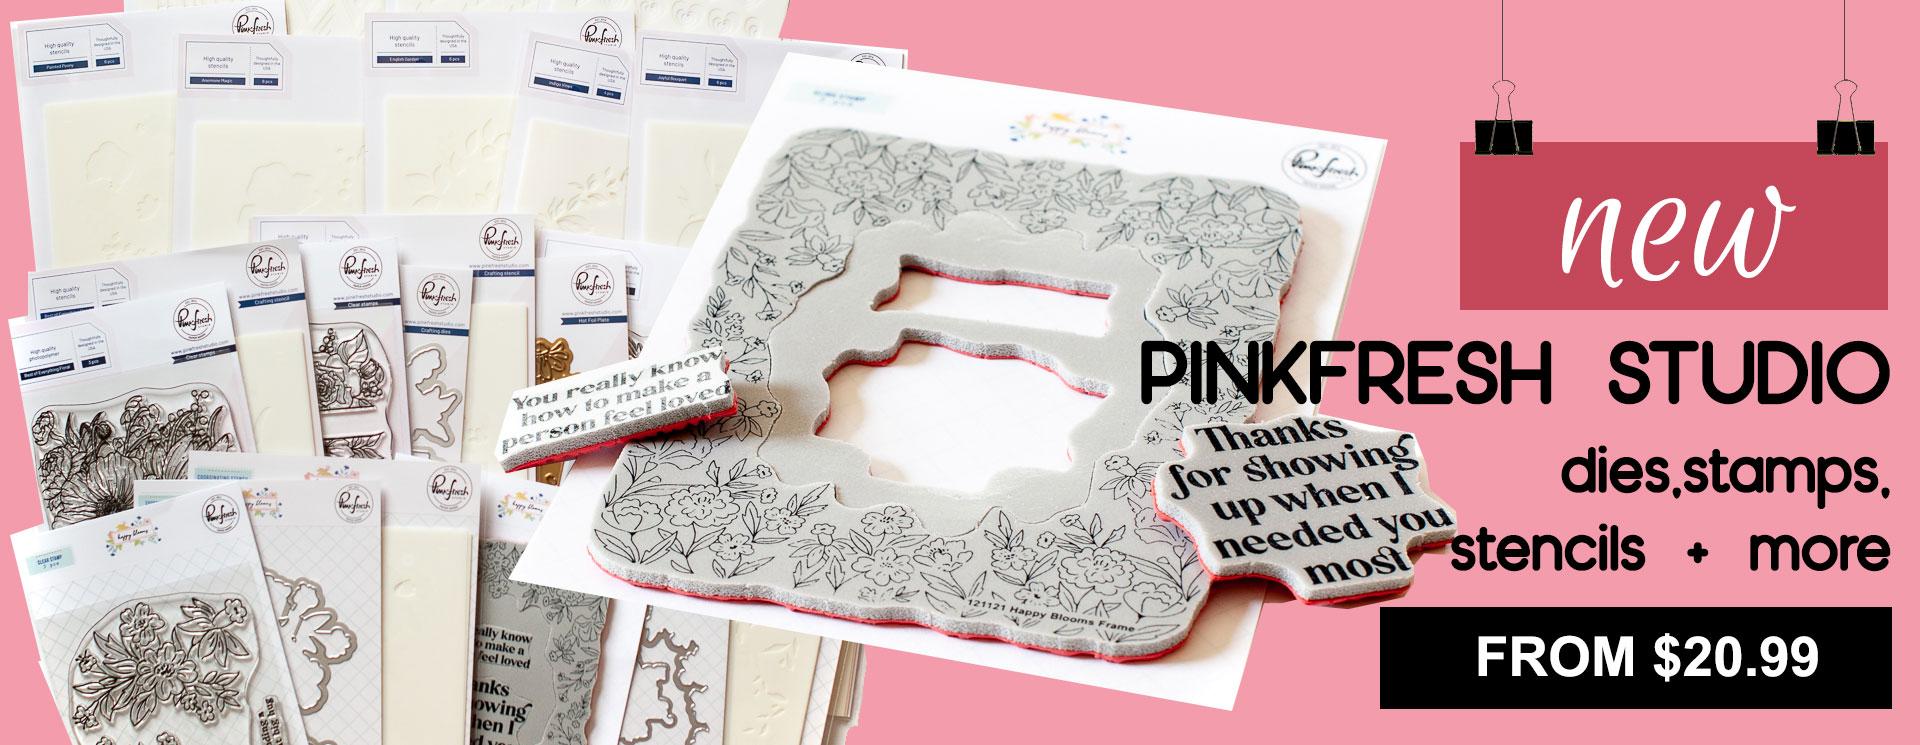 PinkFresh  Studio New Collection